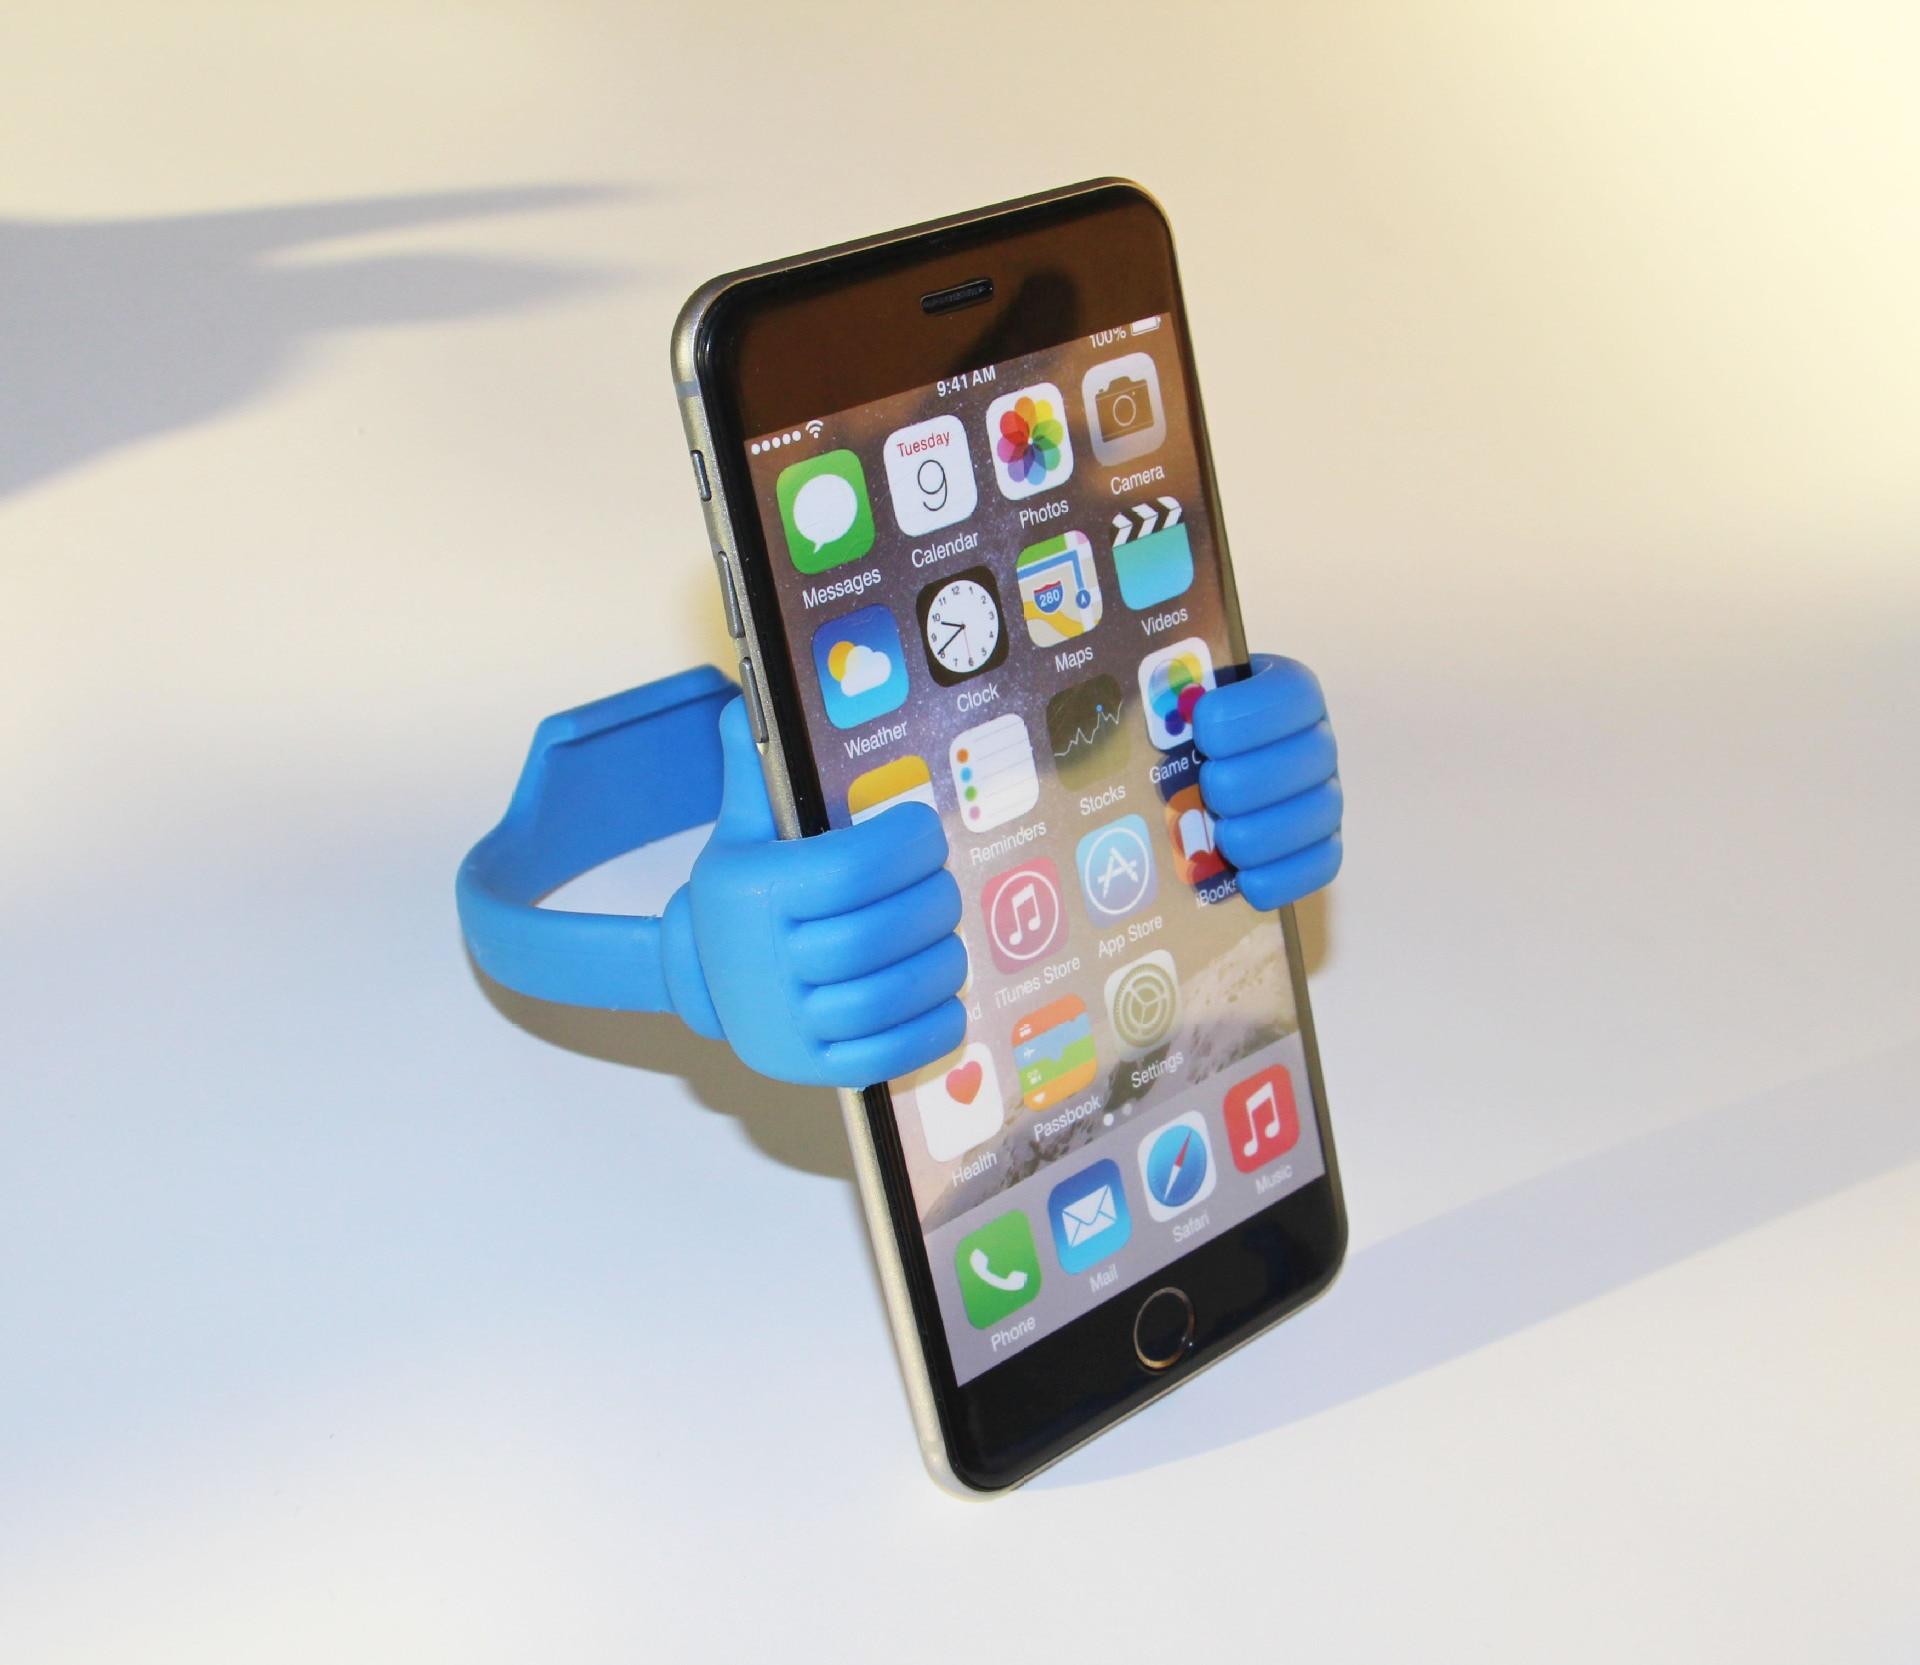 Lazy Mobile Phone Holder Bed Thumb Cell Smartphone Tablet - Ανταλλακτικά και αξεσουάρ κινητών τηλεφώνων - Φωτογραφία 5